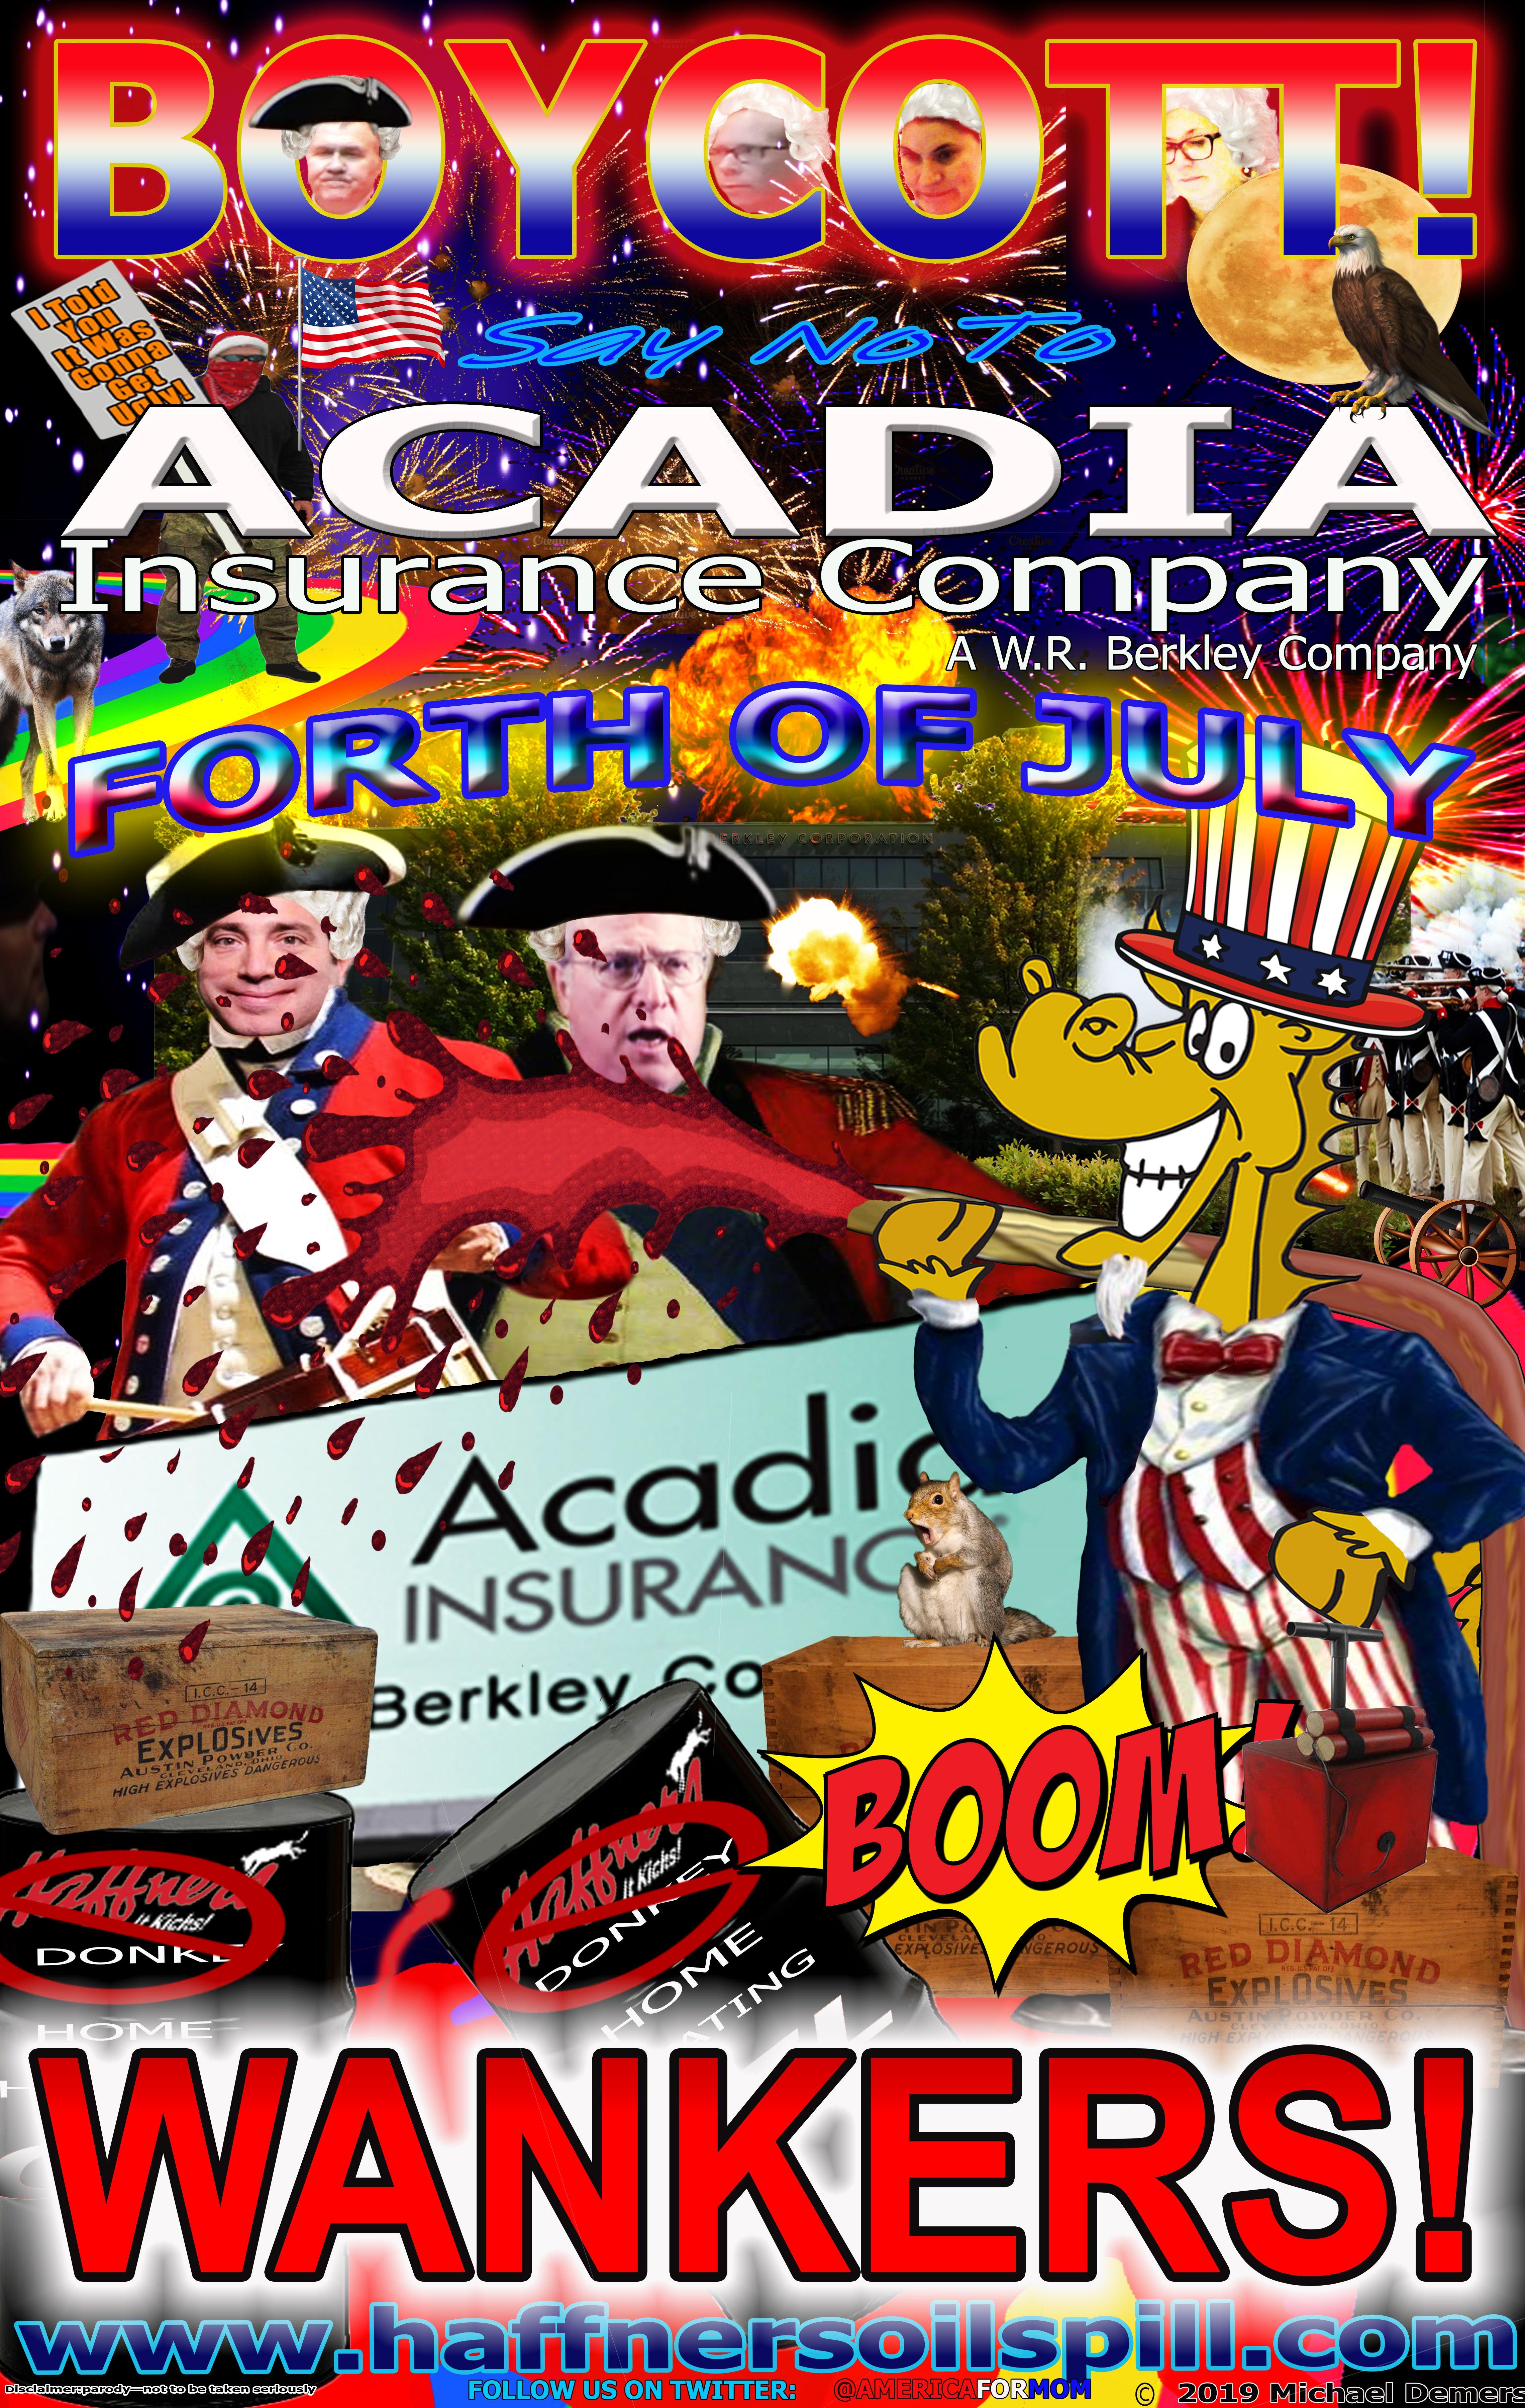 Boycott acadia insurance company w r berkley